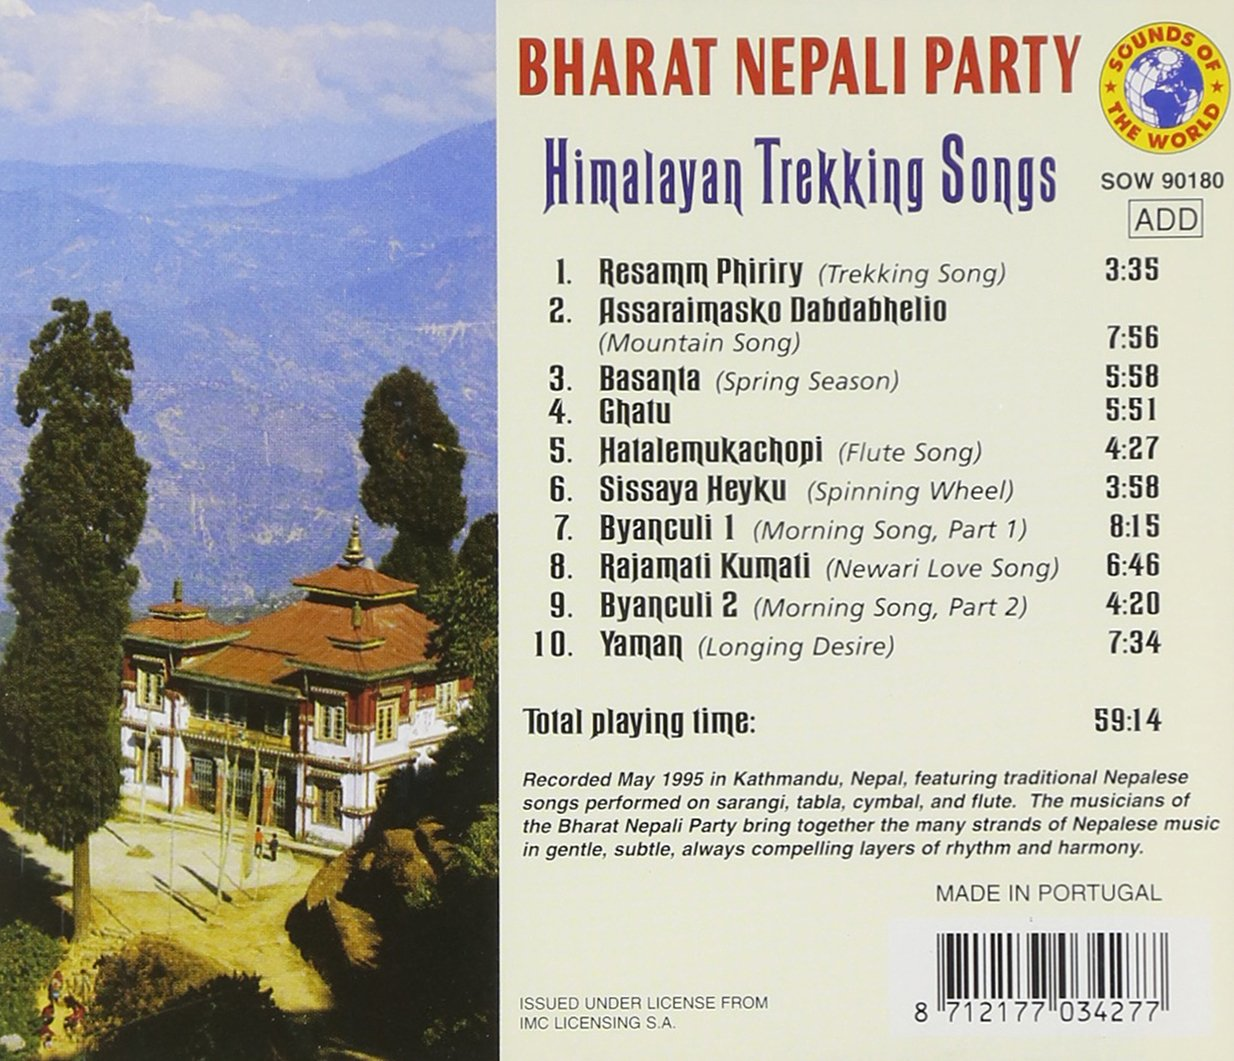 Himalayan Trekking Songs: Bharat Nepali Party: Amazon.es: Música